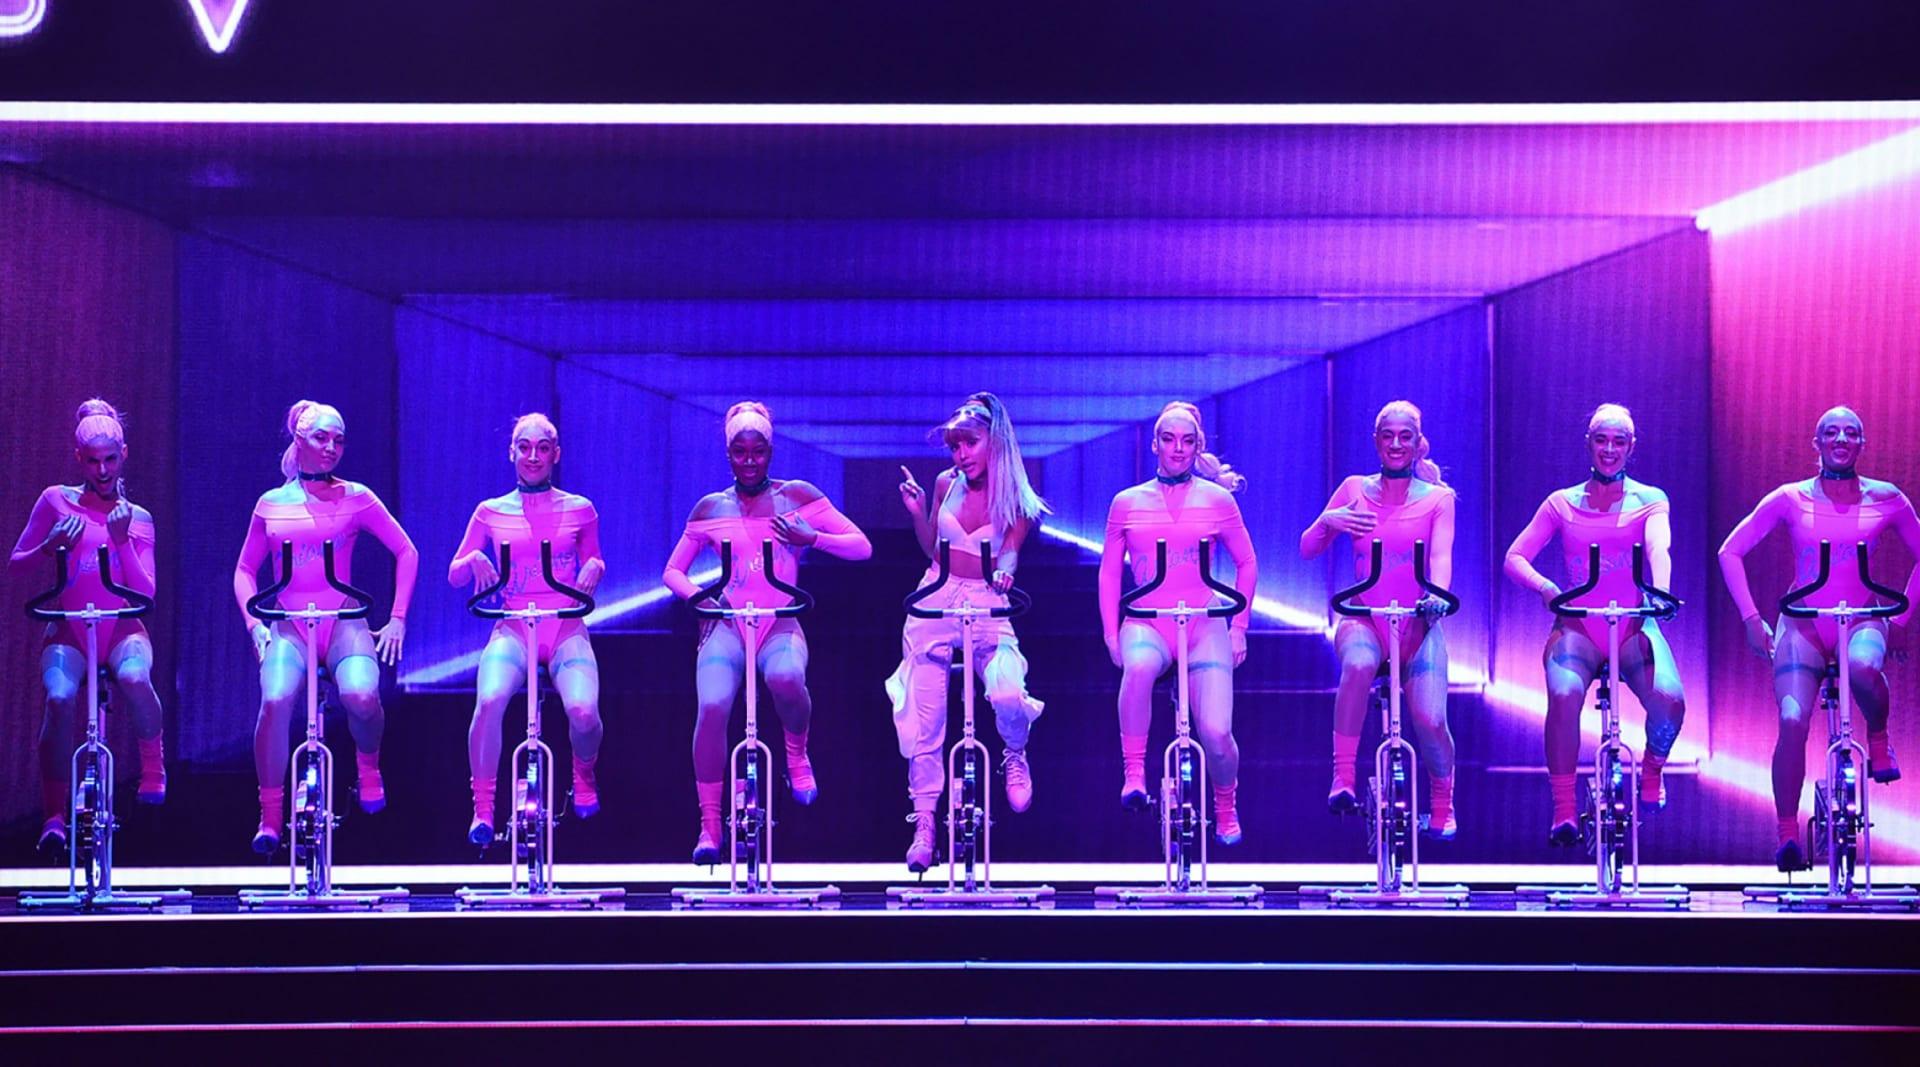 WEB Ariana Grande MTV VMA perform 2016 billboard 1548